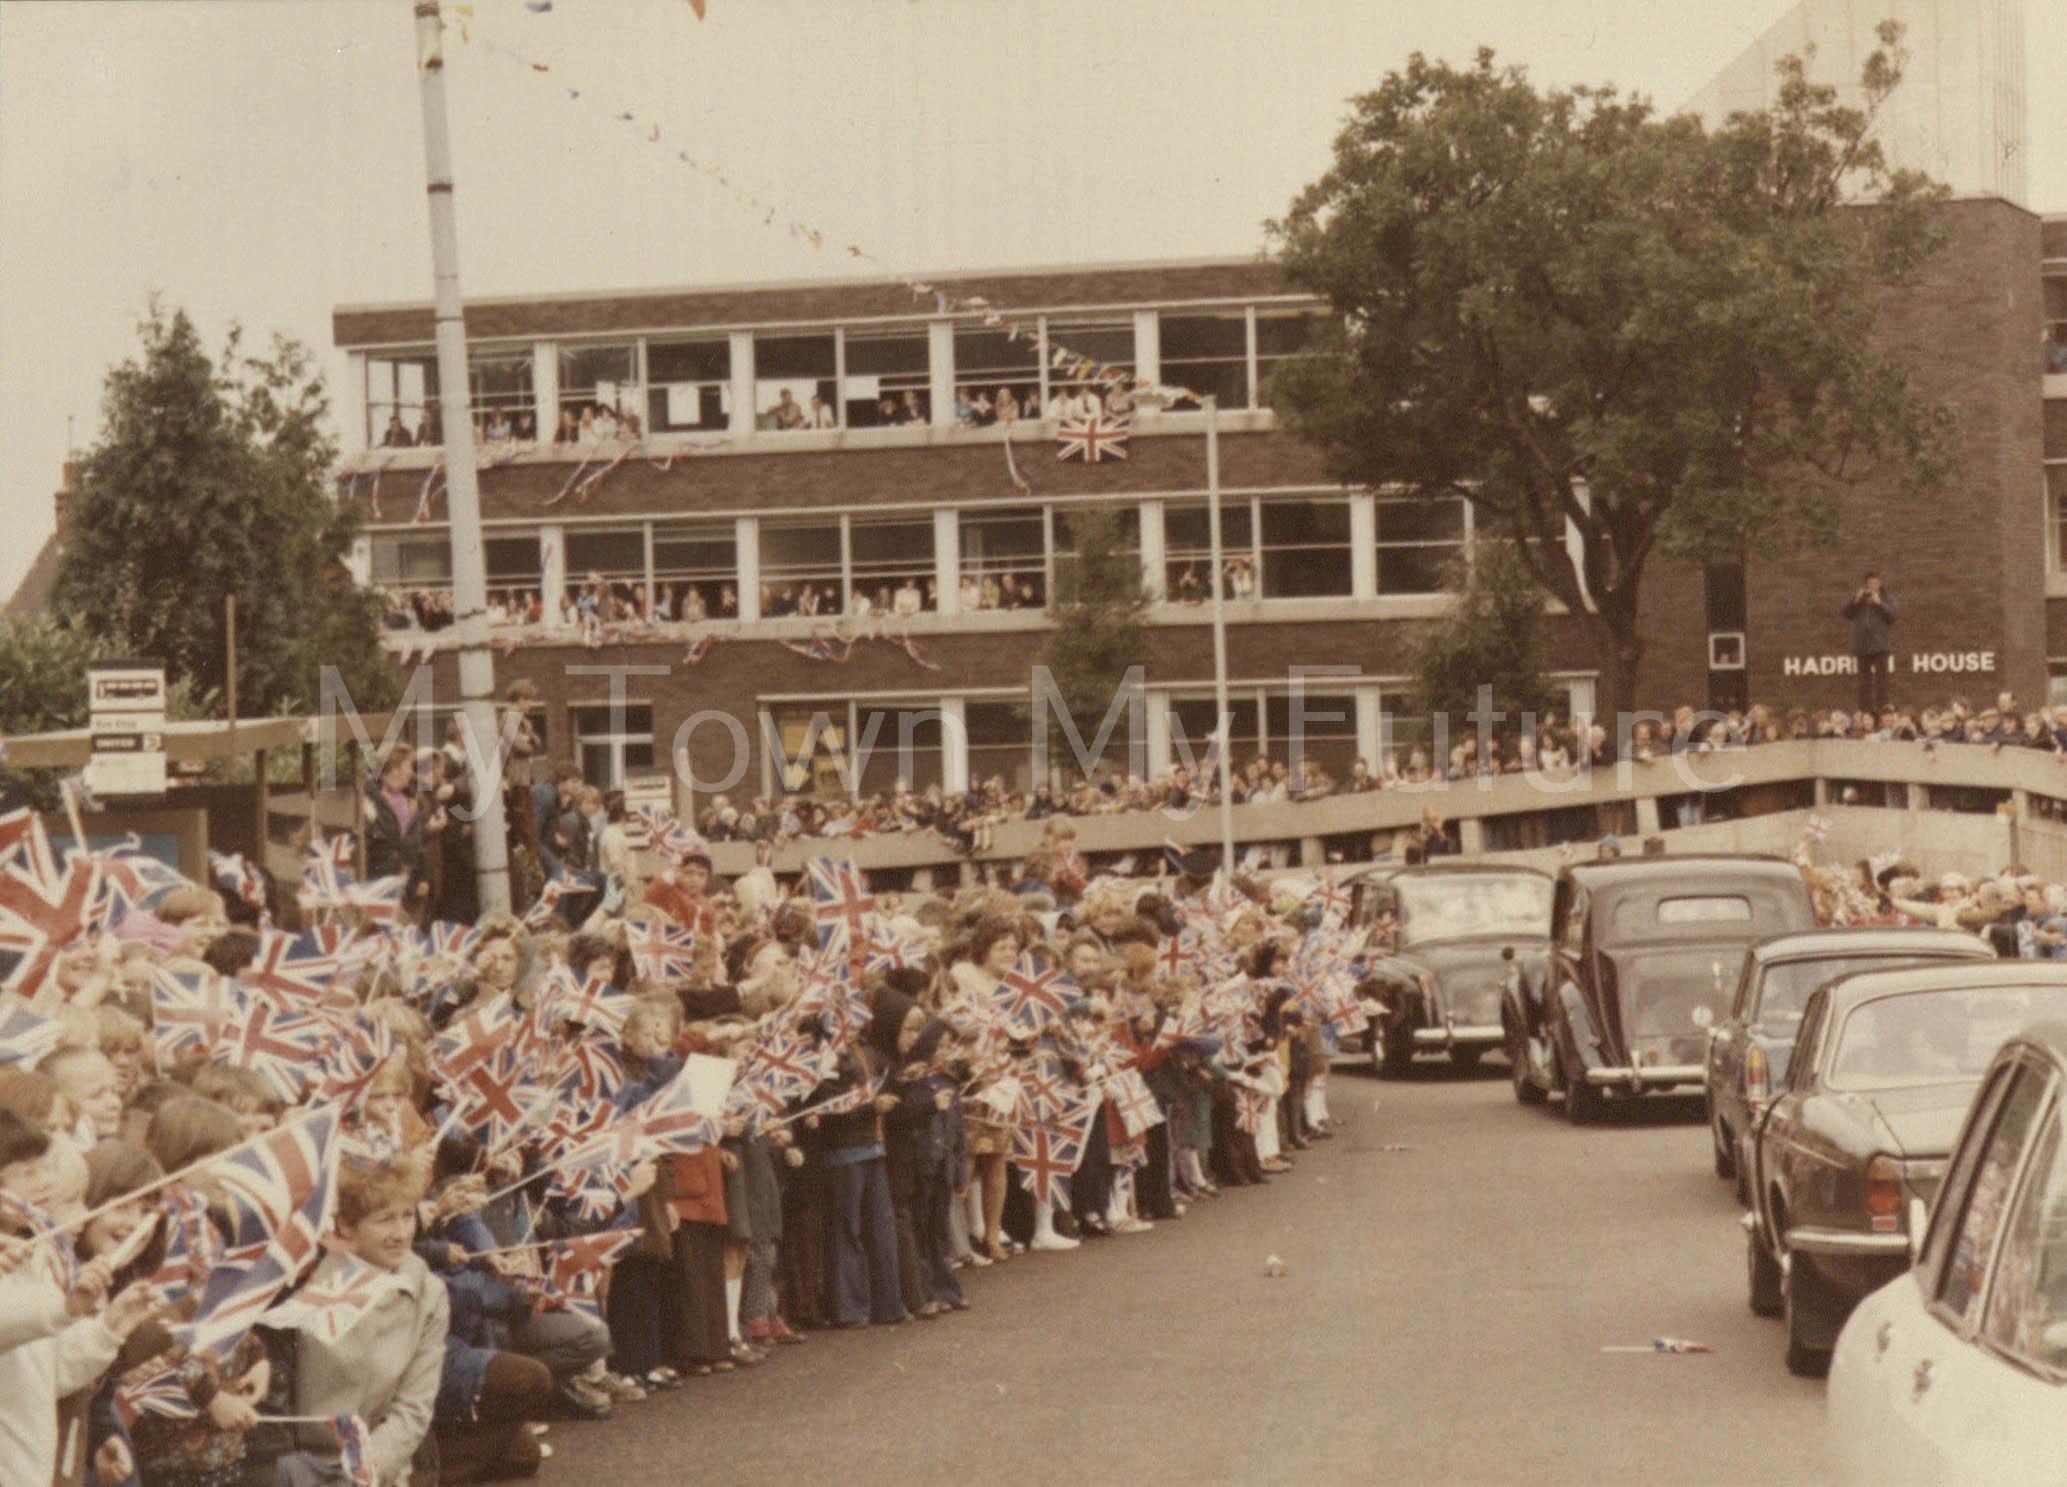 Queen Elizabeth Silver Jubilee visit to Cleveland 1977